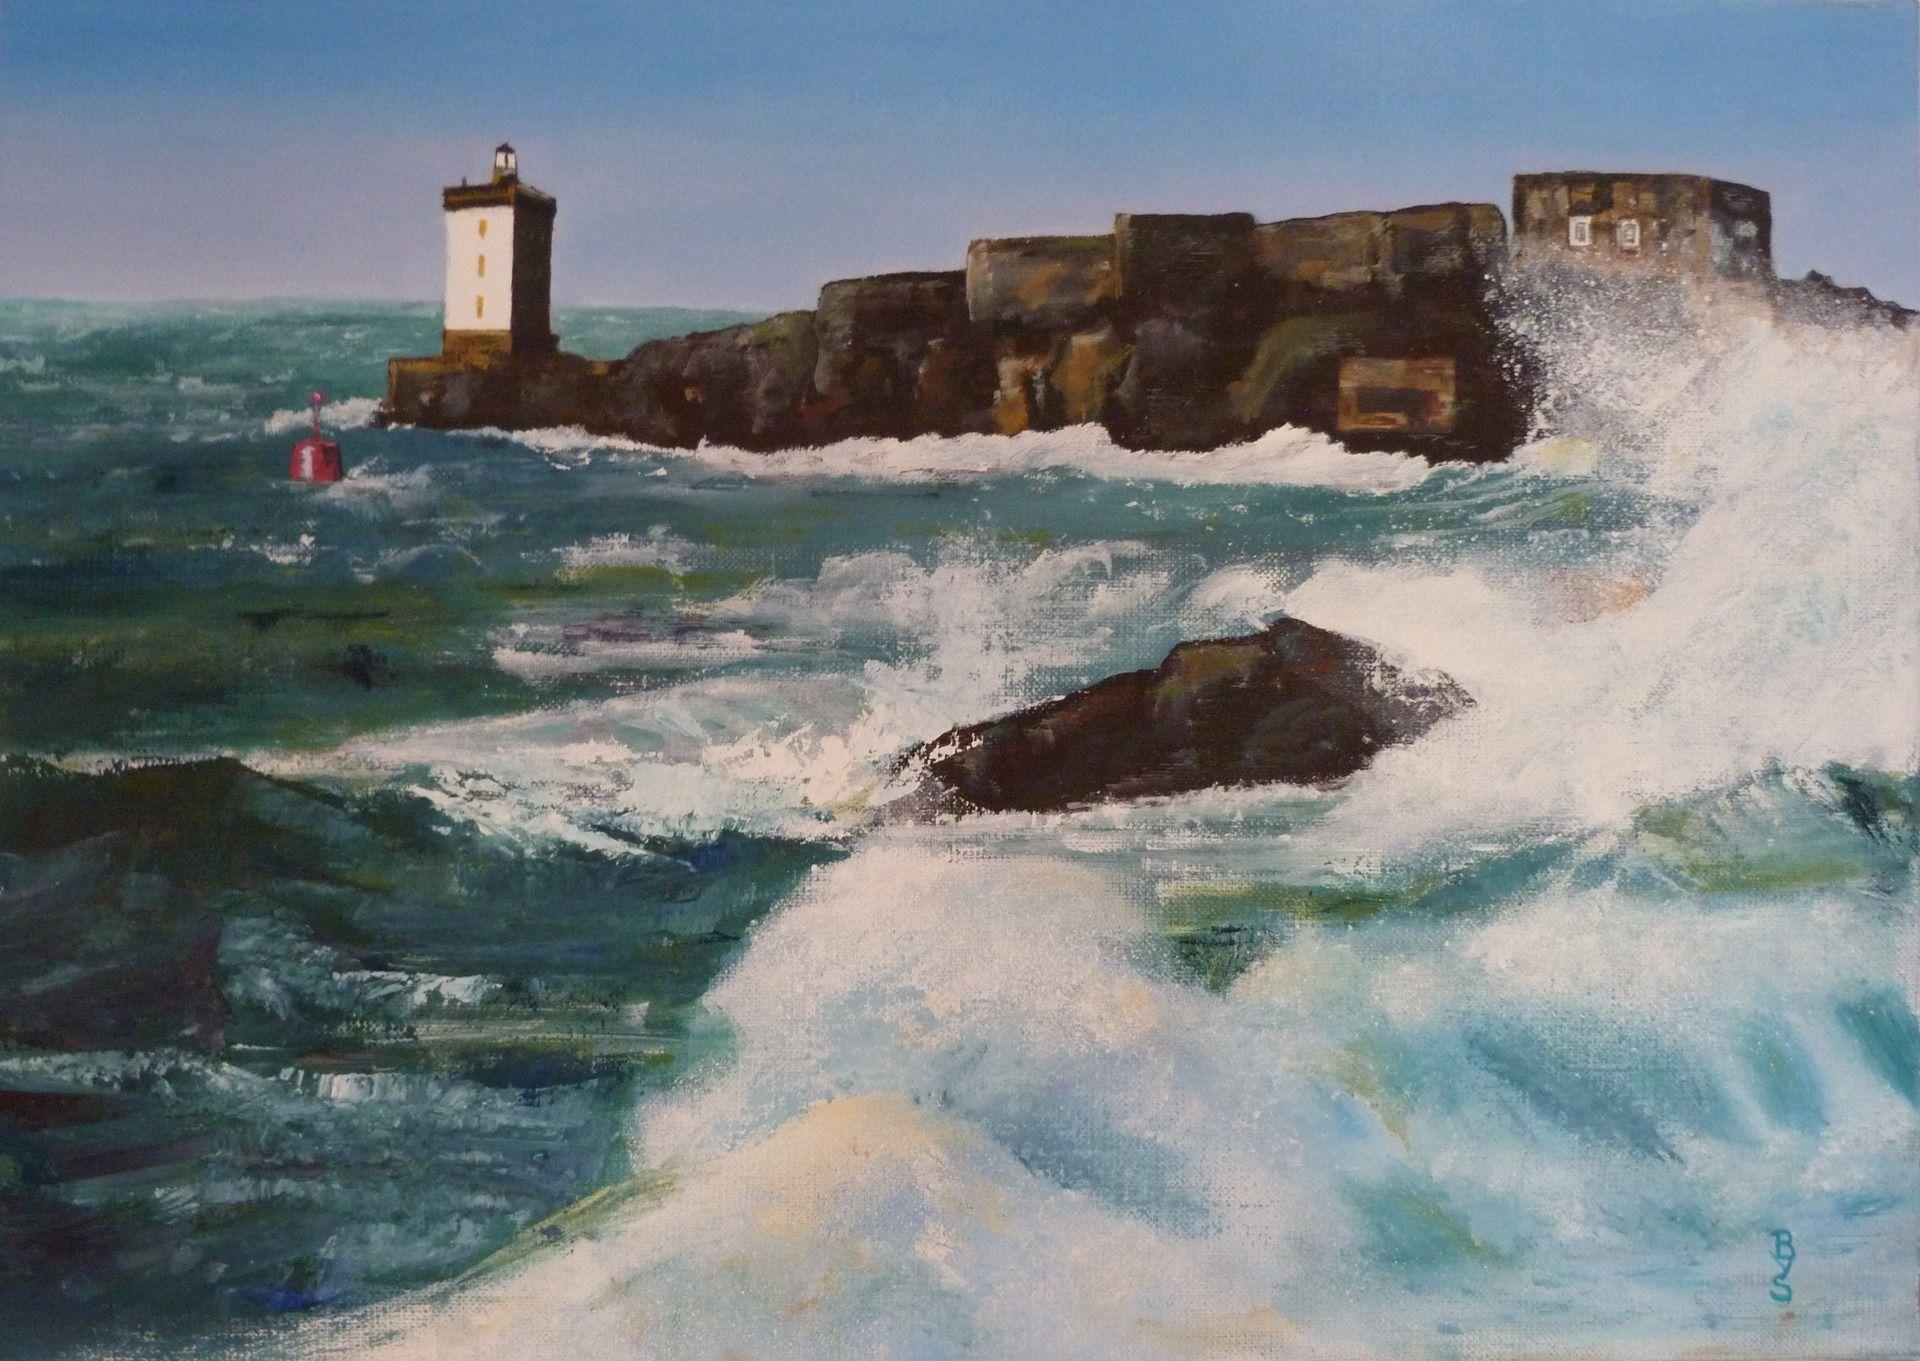 Peinture A L Huile Mer Dechainee Phare Et Rocher Peintures